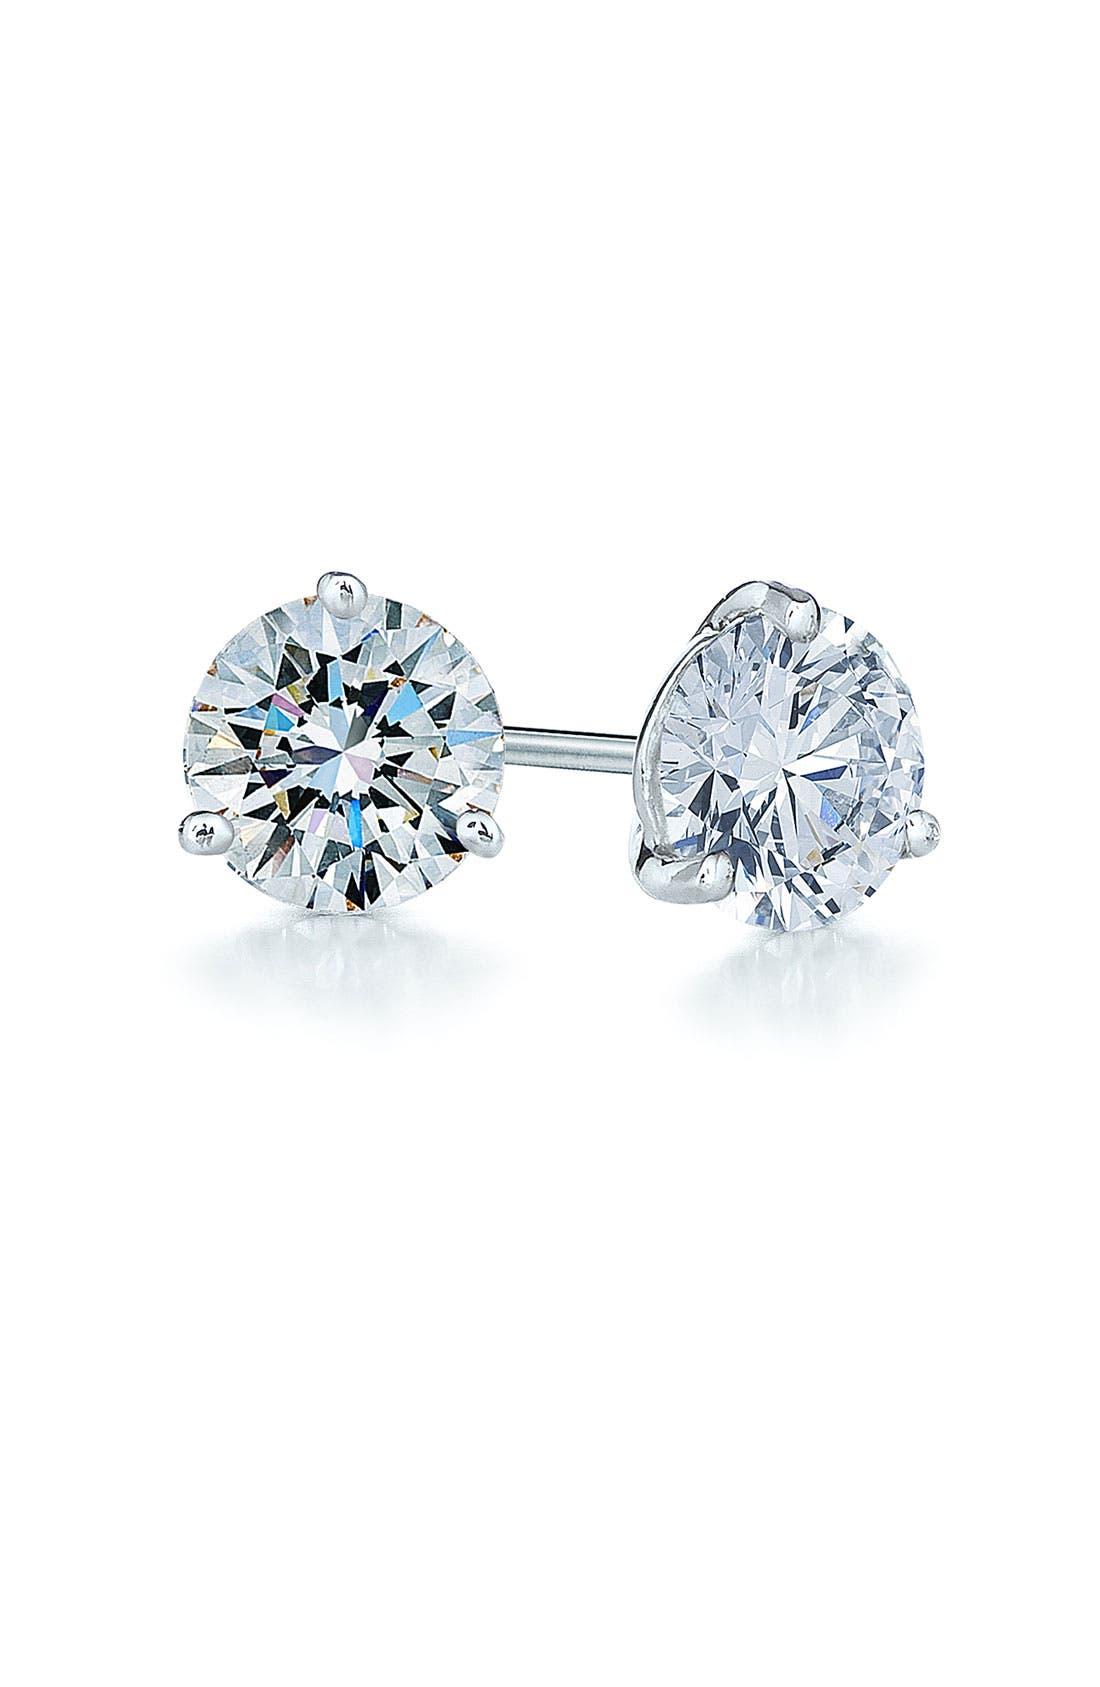 1ct tw Diamond & Platinum Stud Earrings,                         Main,                         color, PLATINUM